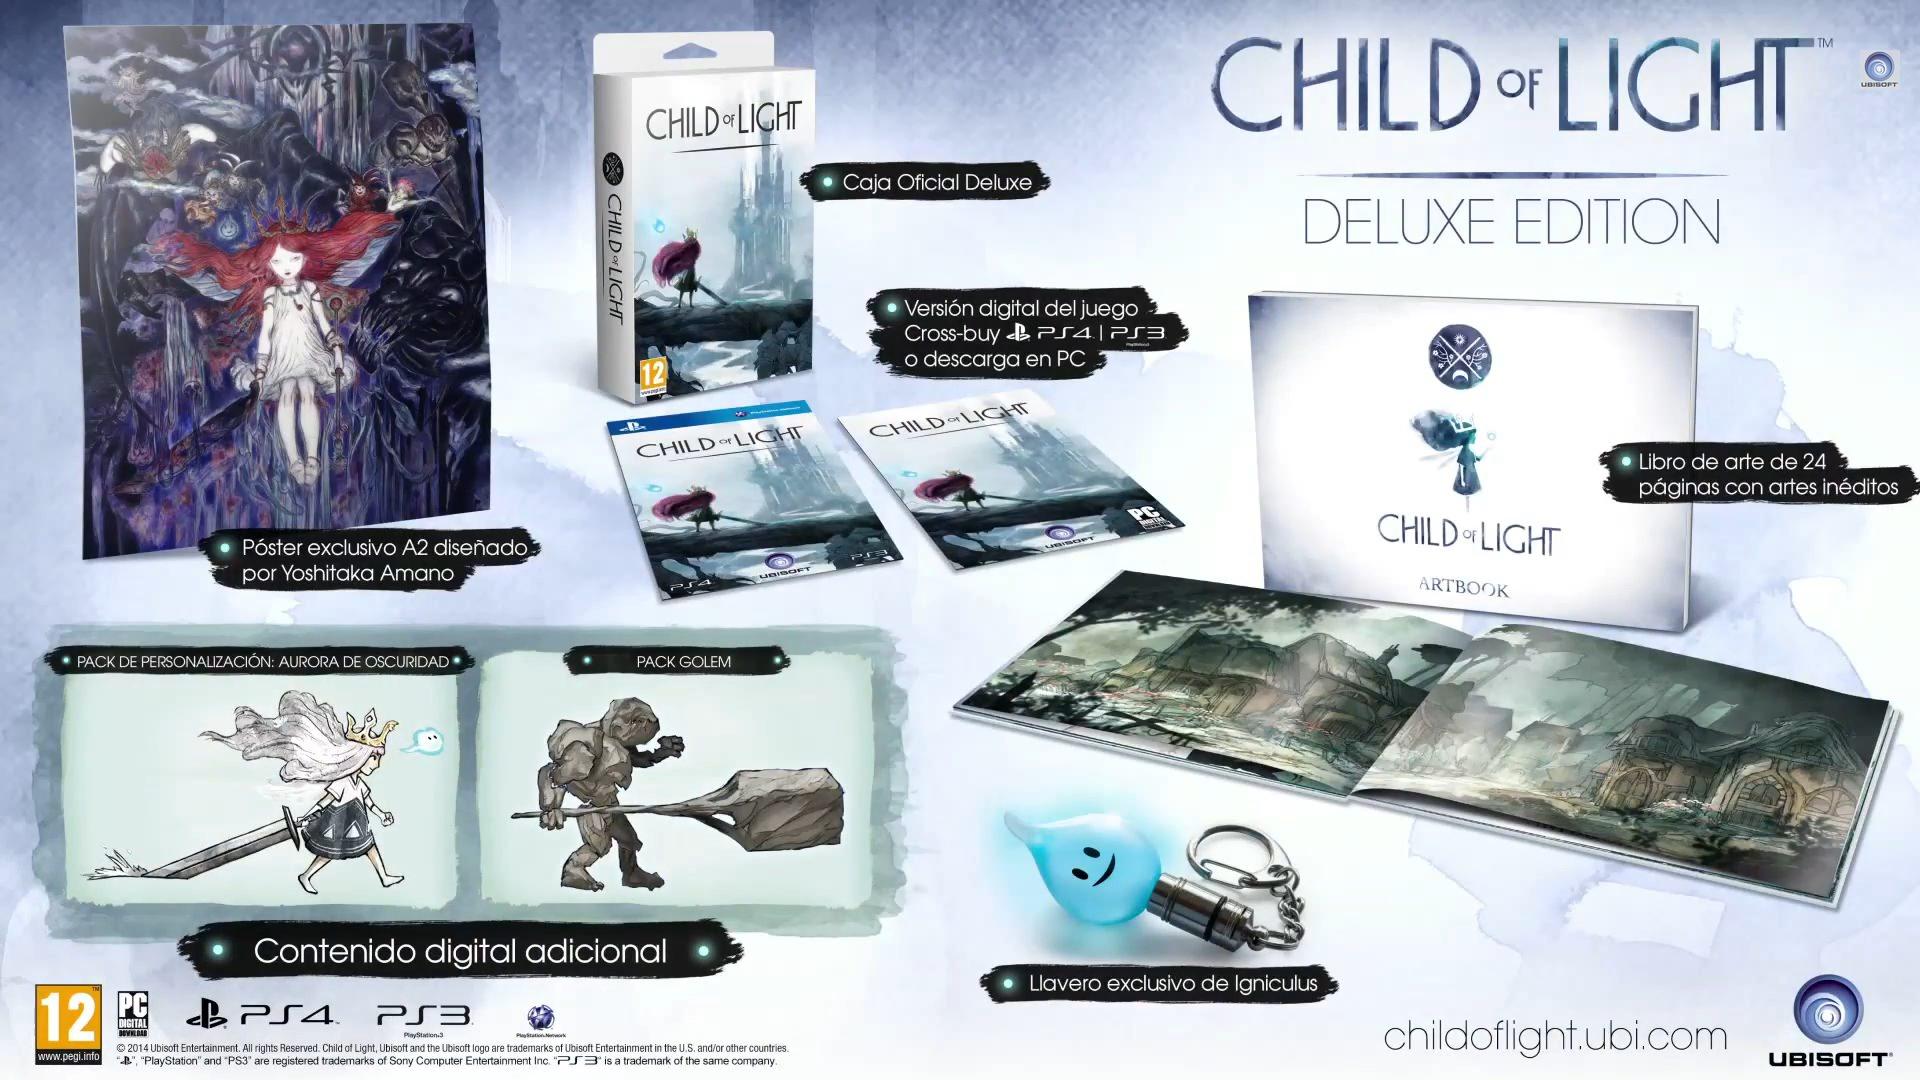 http://www.edicioncoleccionista.com/wp-content/uploads/2014/03/Child-of-Light-Edici%C3%B3n-Deluxe.jpg